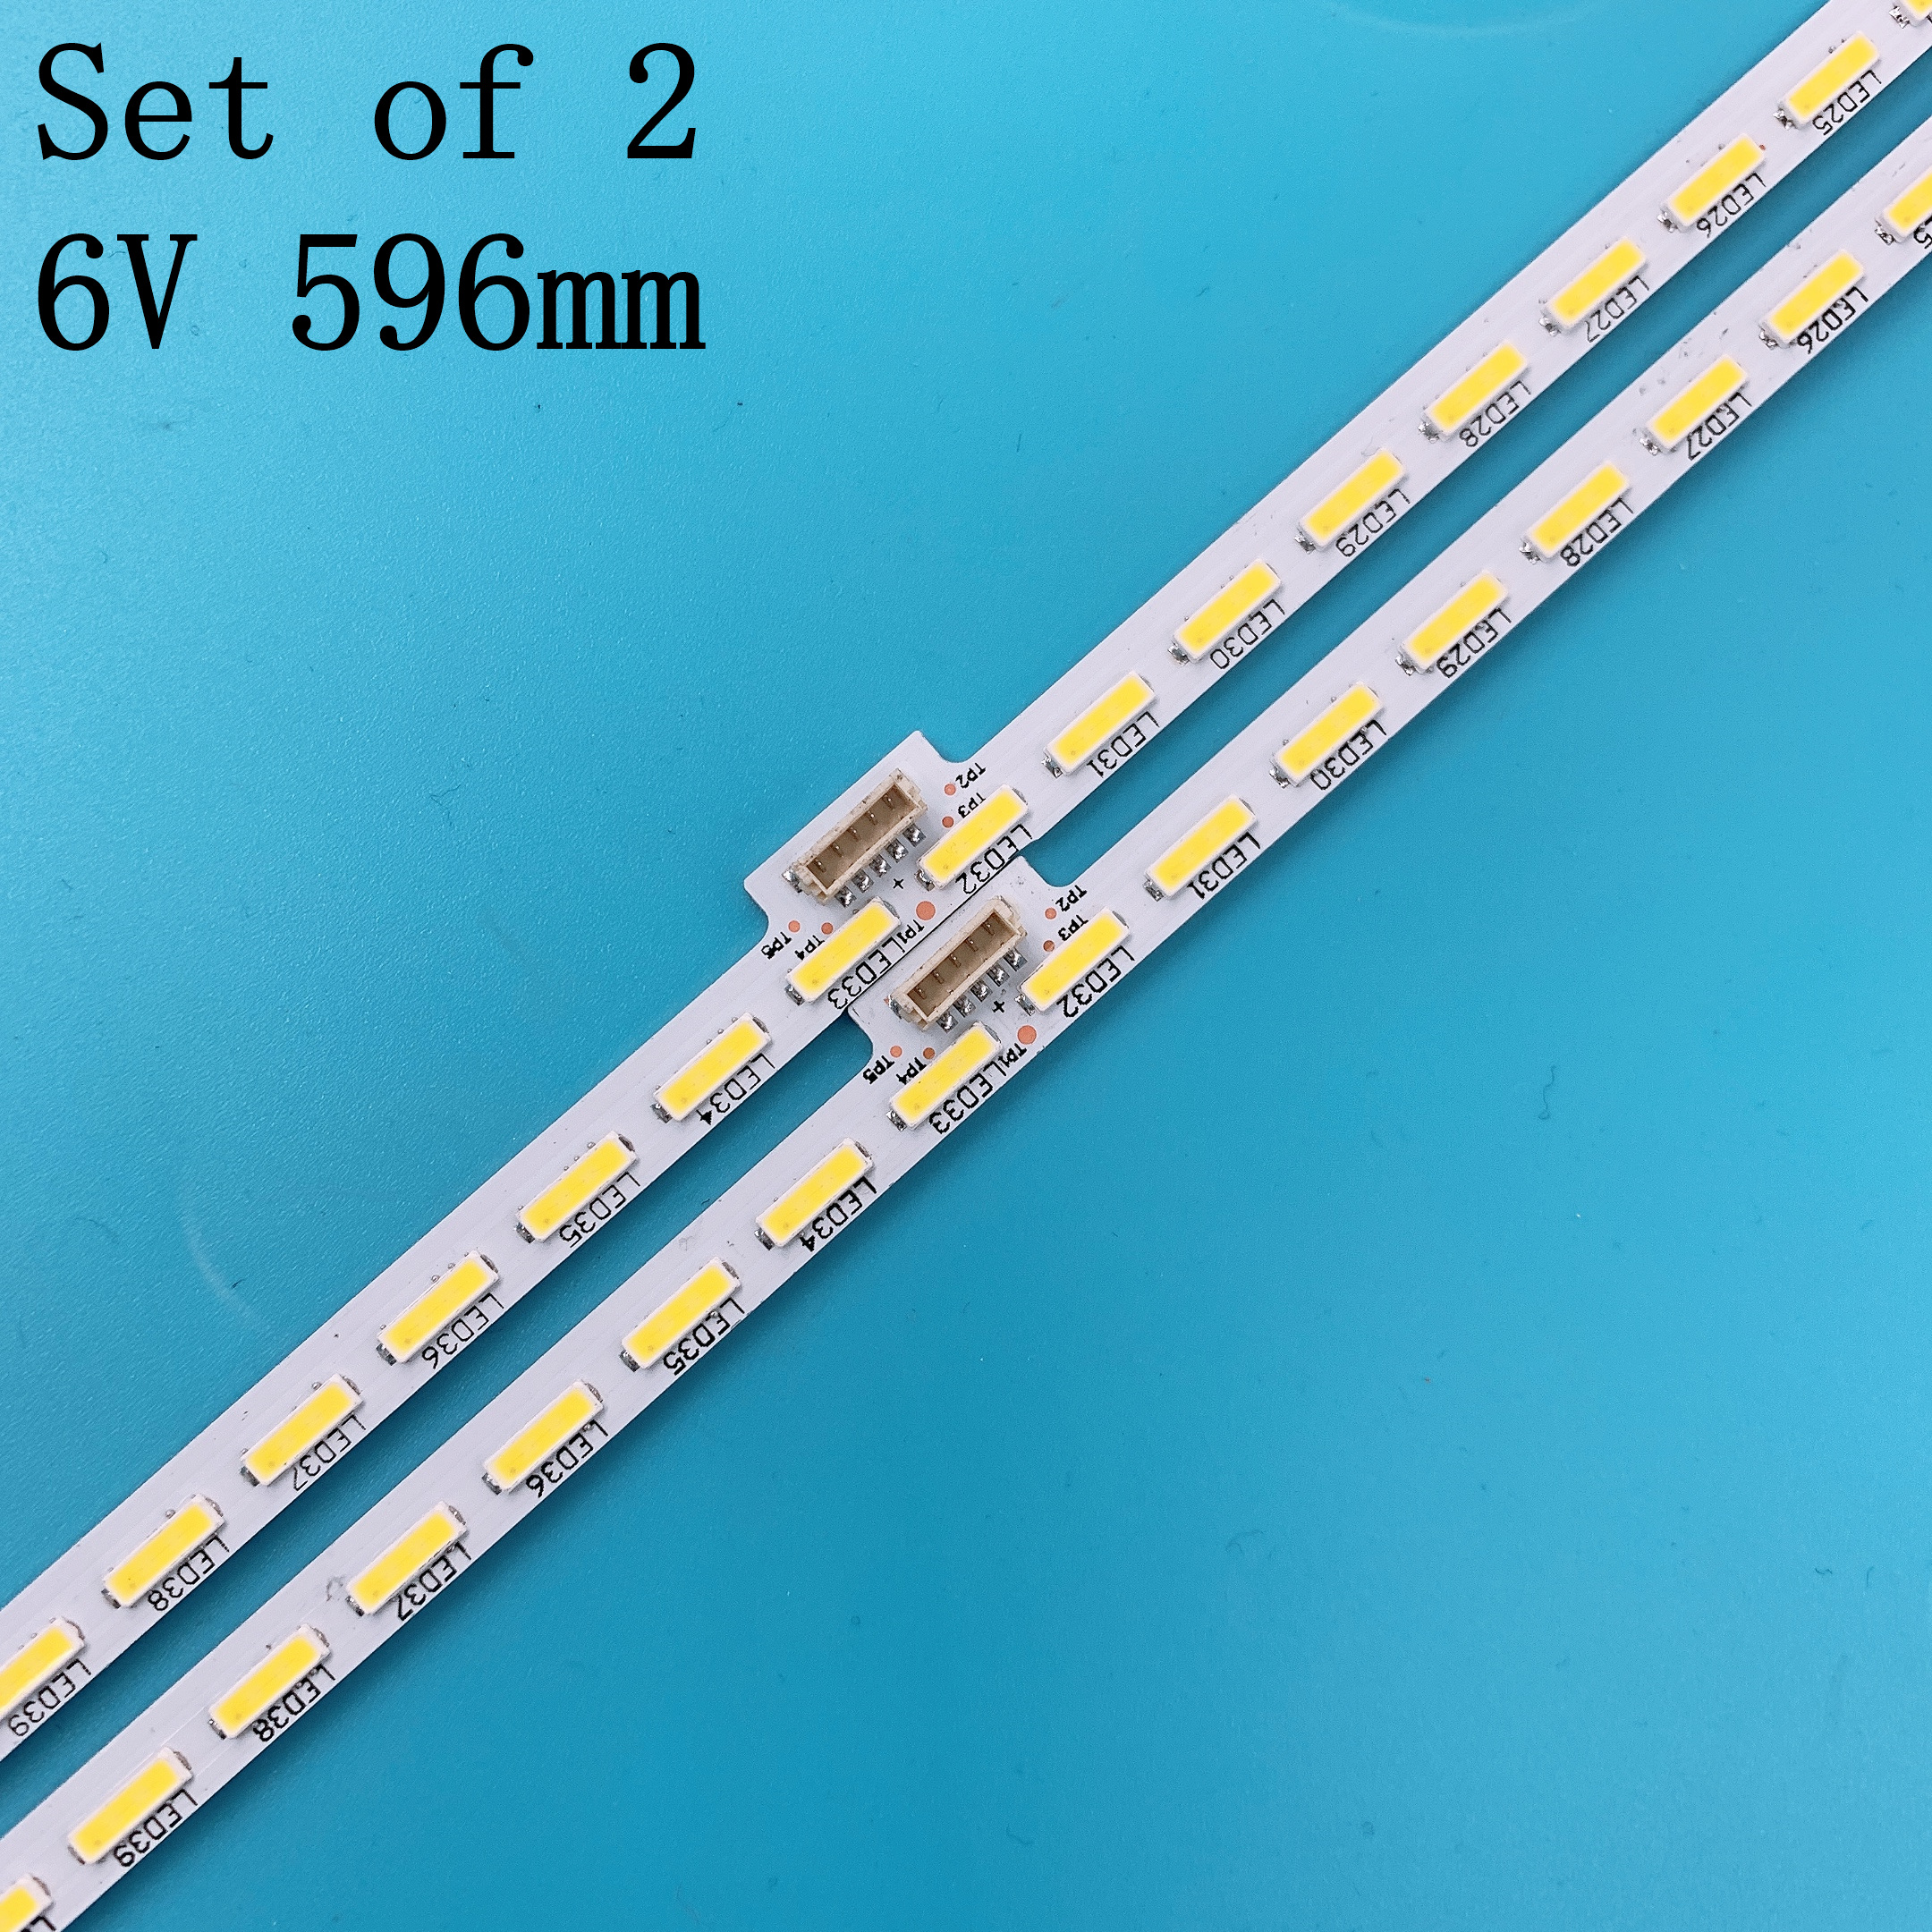 LED Backlight For Sony 55 Inch TV Industrial DC 2 1 Years YLS_HRN55_7020_REV2 YLS_HAN55_7020_REV2 15521N SYV5541 KD-55X8505C